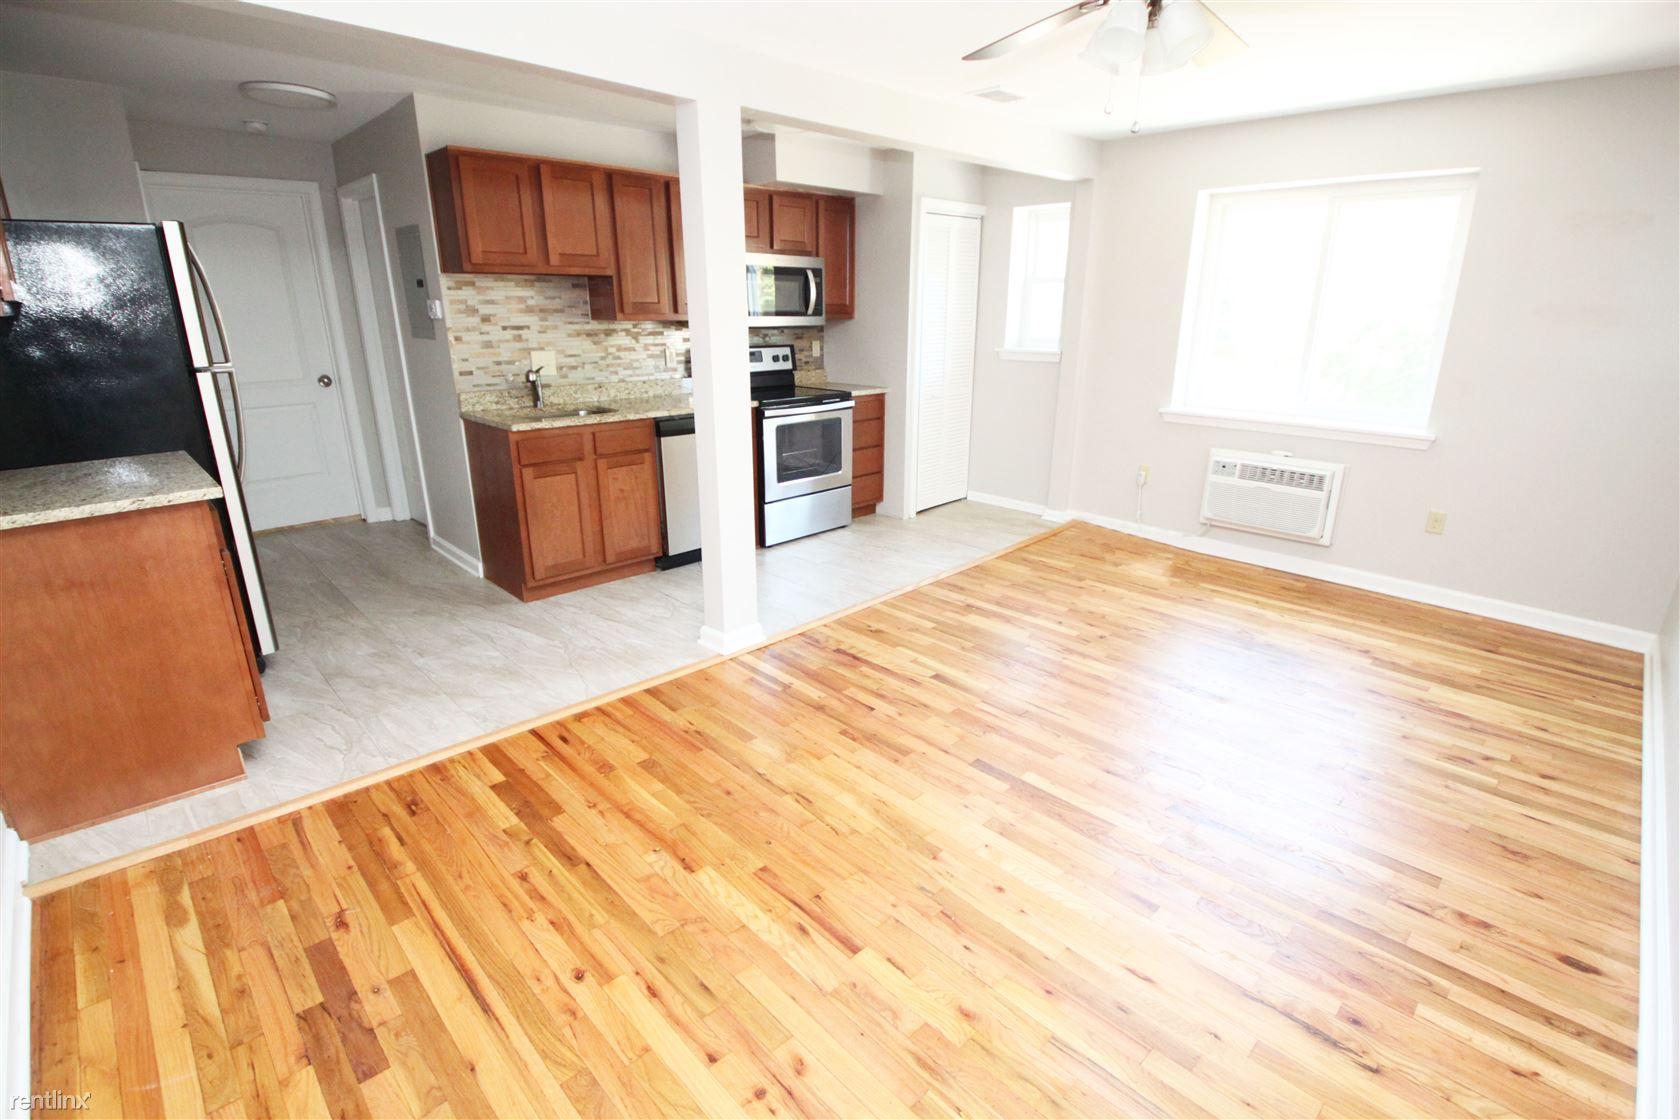 50 Sumner Ave, Bellevue, PA - $849 USD/ month